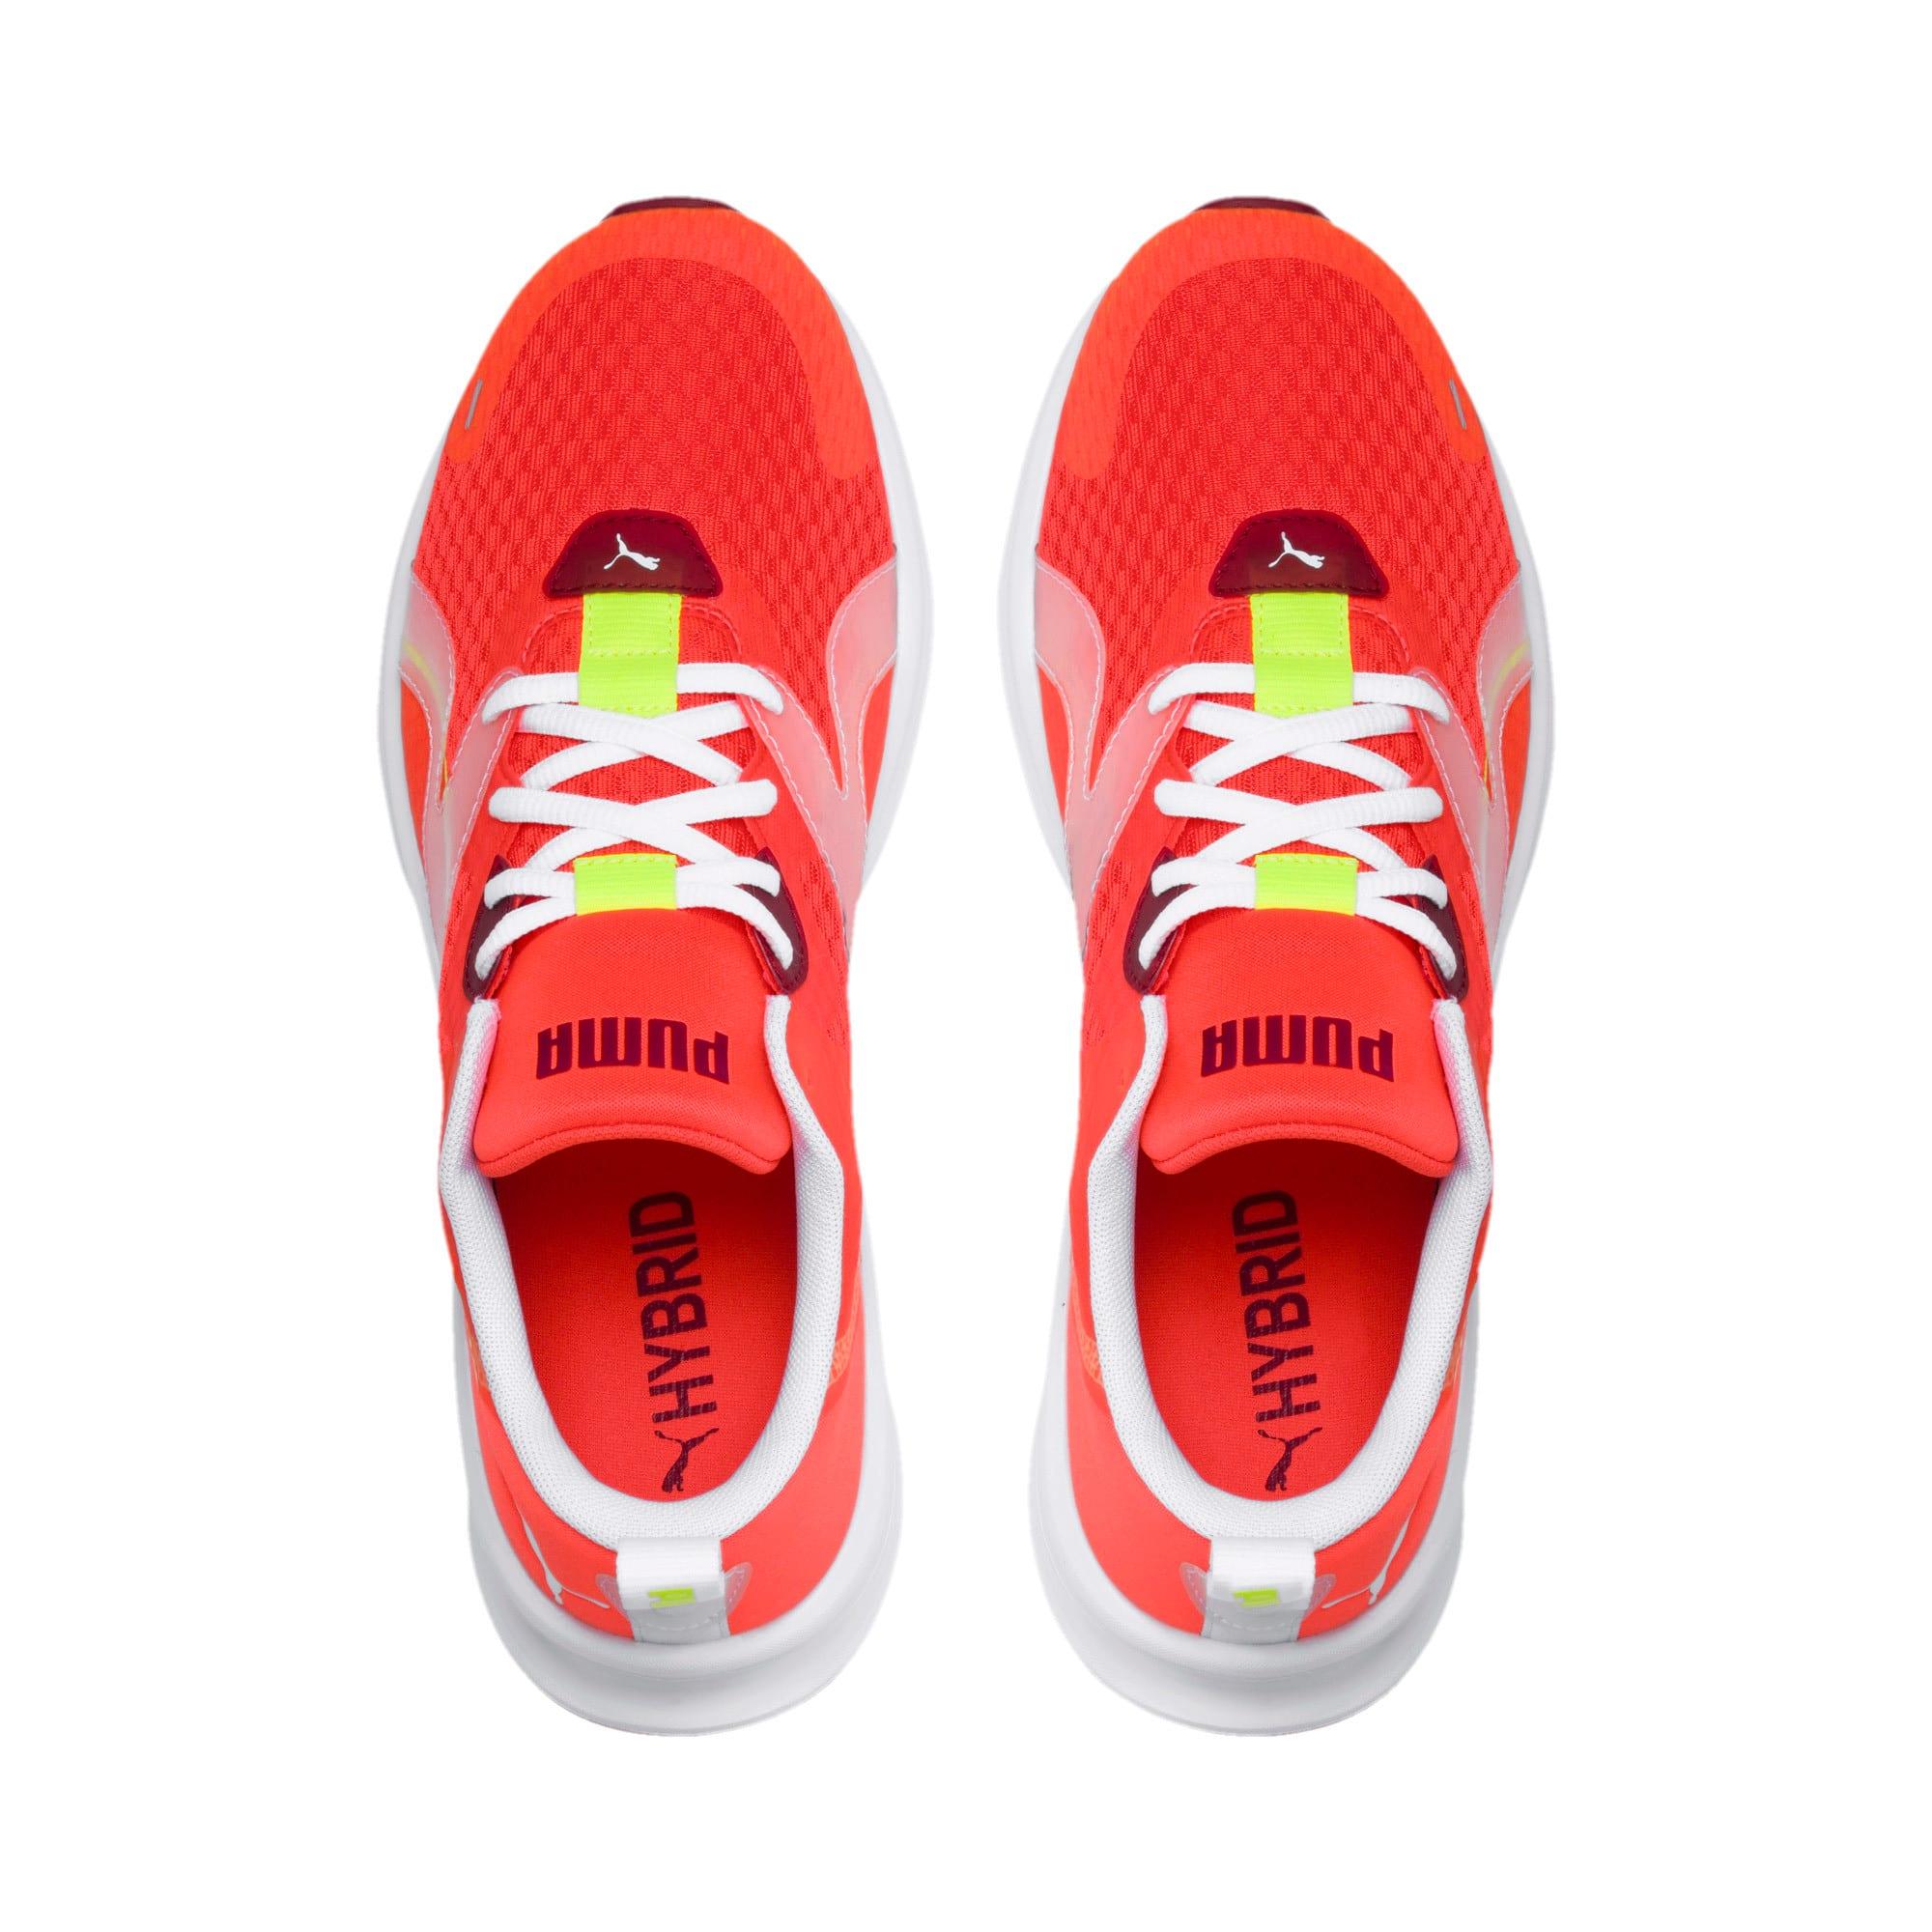 Thumbnail 6 of HYBRID Fuego Men's Running Shoes, Nrgy Red-Rhubarb, medium